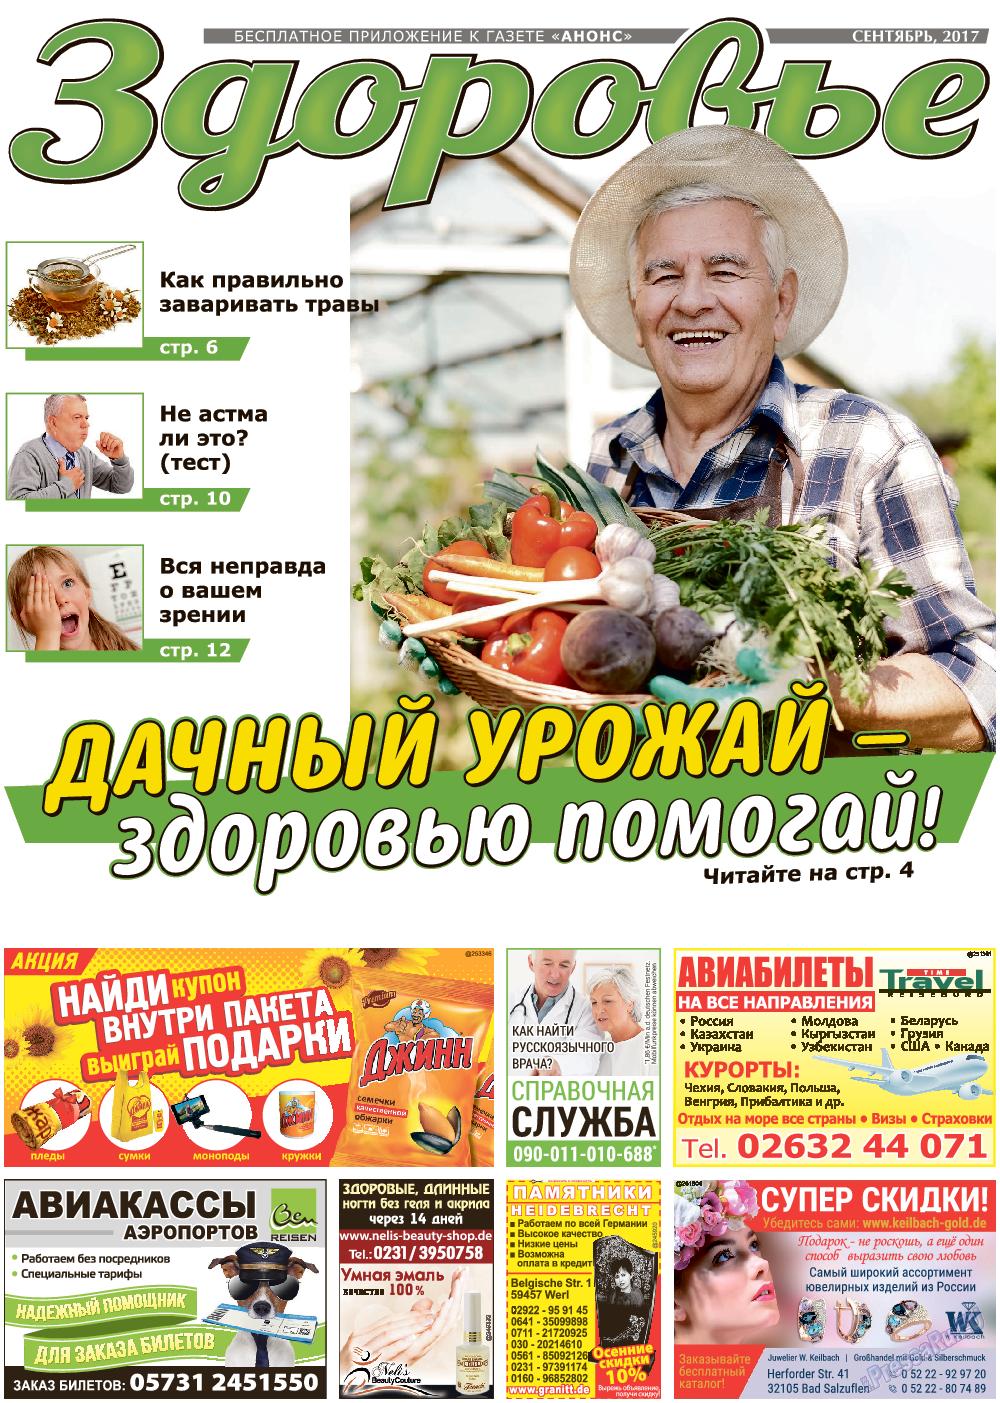 Здоровье (газета). 2017 год, номер 9, стр. 1